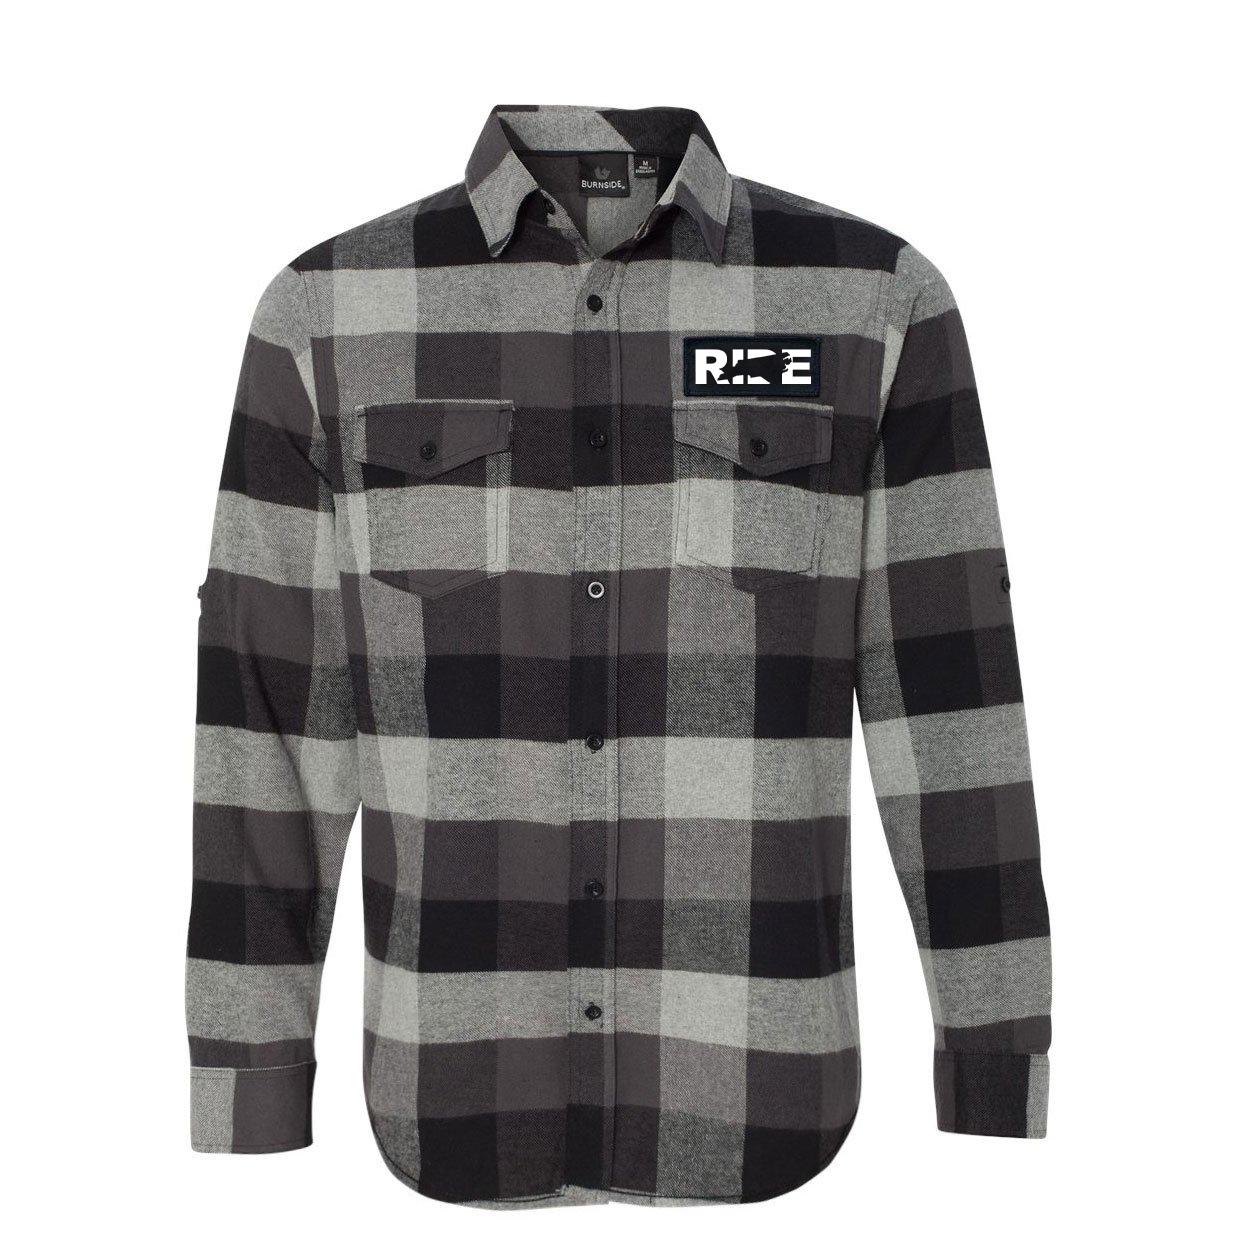 Ride North Carolina Classic Unisex Long Sleeve Woven Patch Flannel Shirt Black/Gray (White Logo)